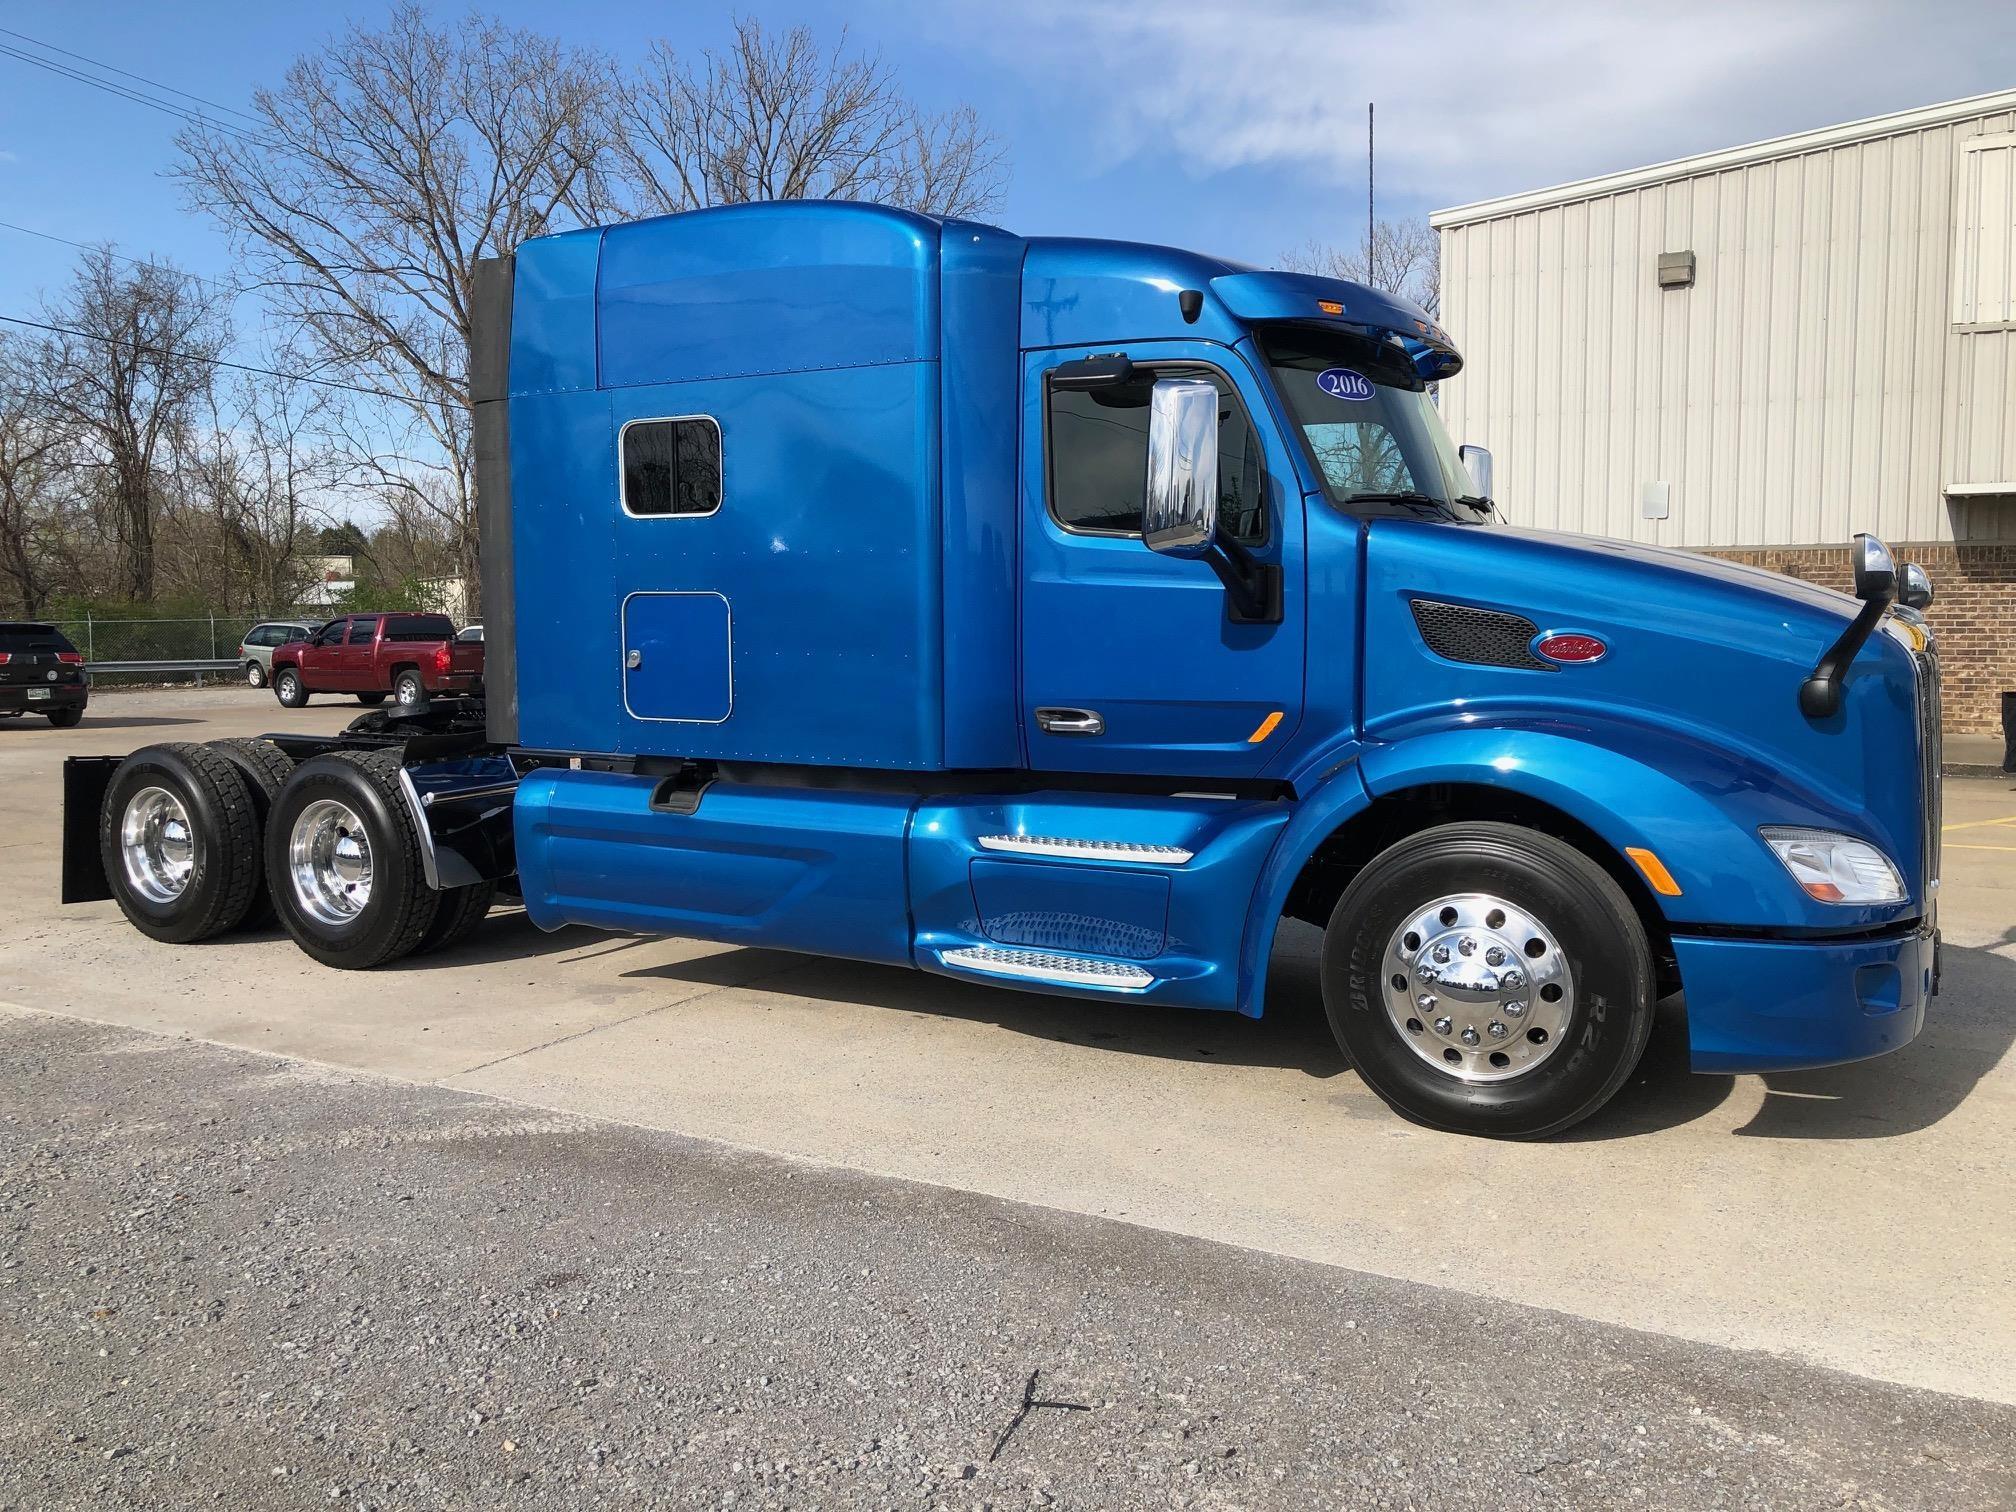 Buy Used Caterpillar Heavy Duty Trucks | Thompson Machinery